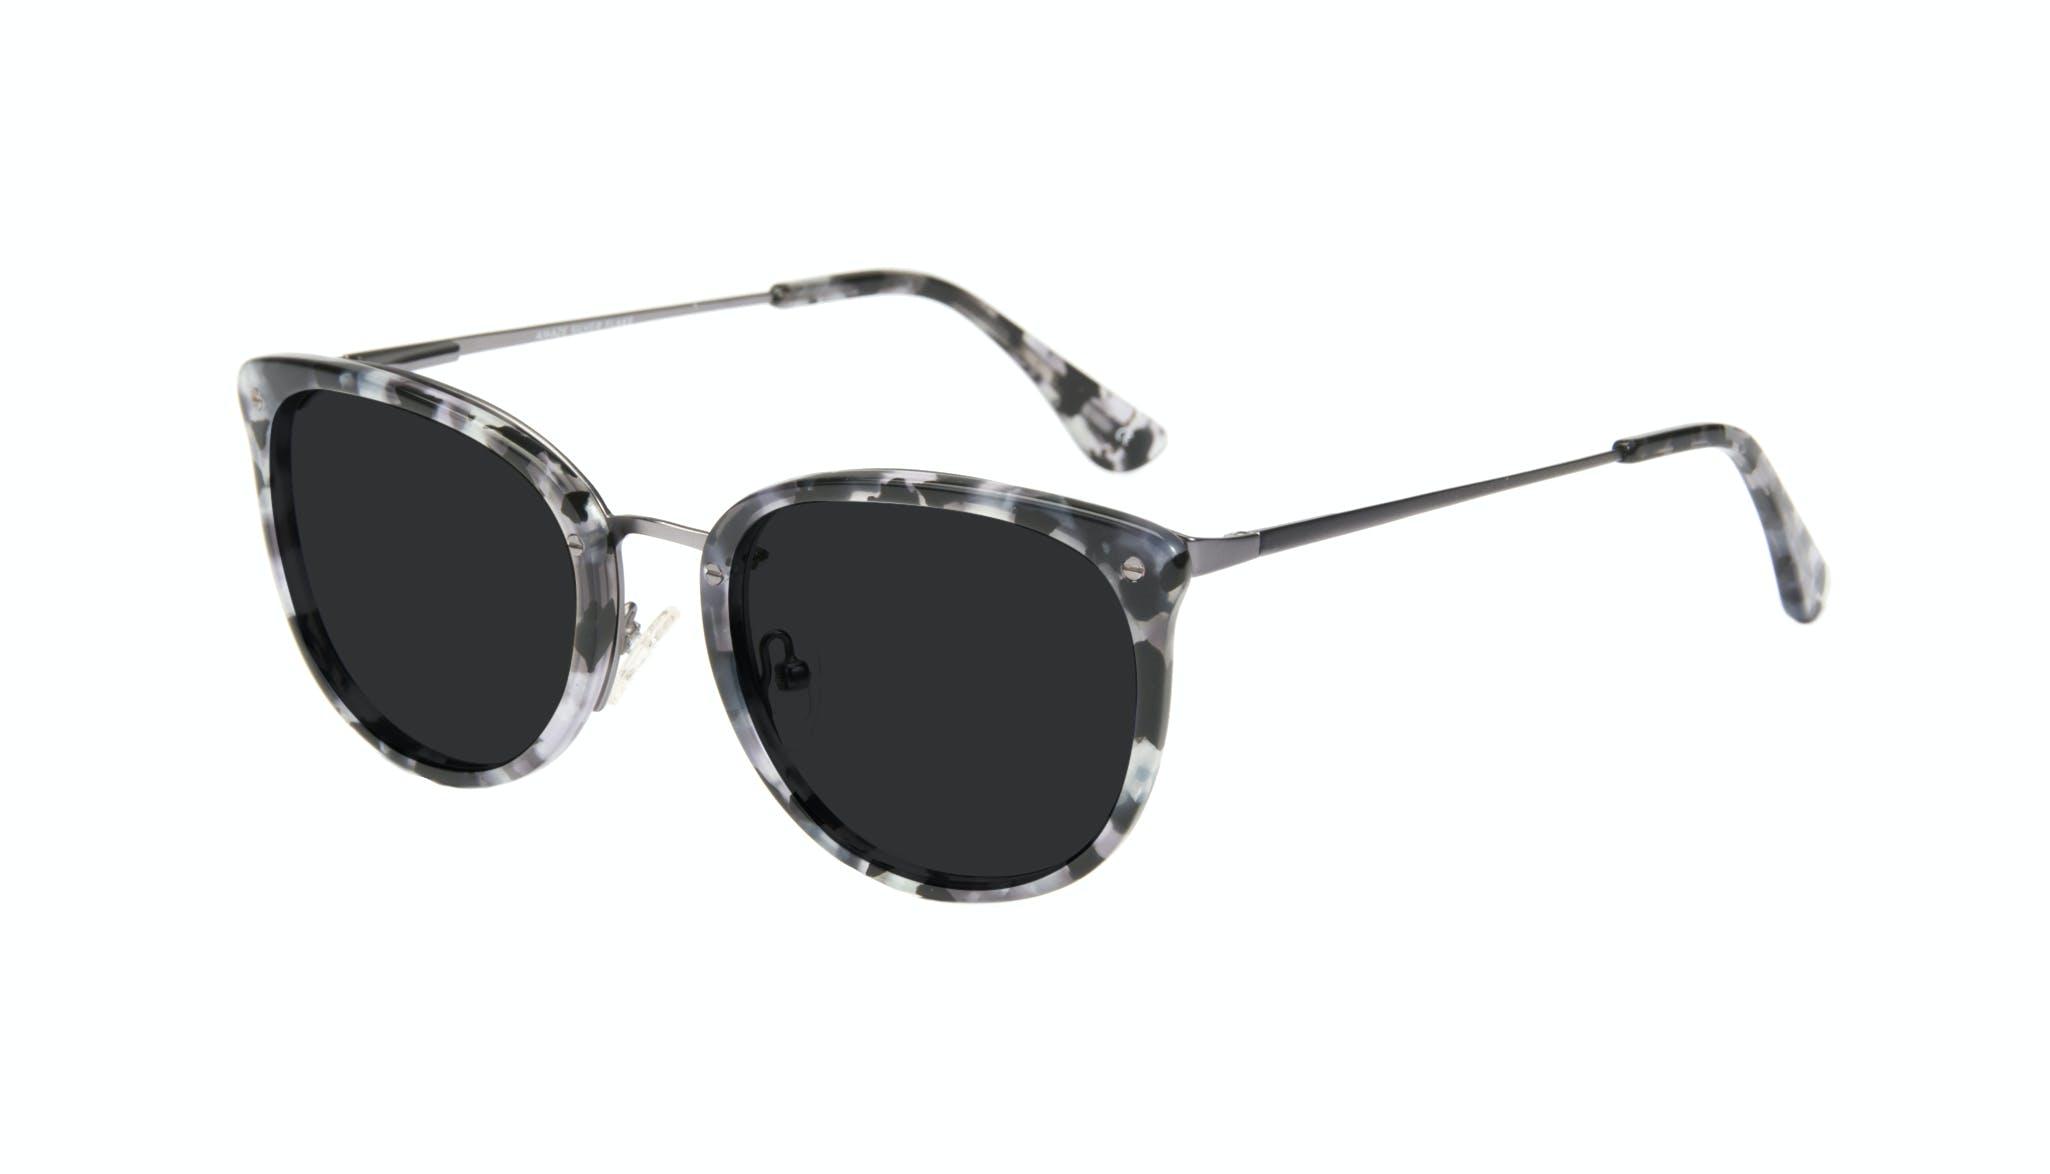 Affordable Fashion Glasses Square Round Sunglasses Women Amaze Silver Flake Tilt